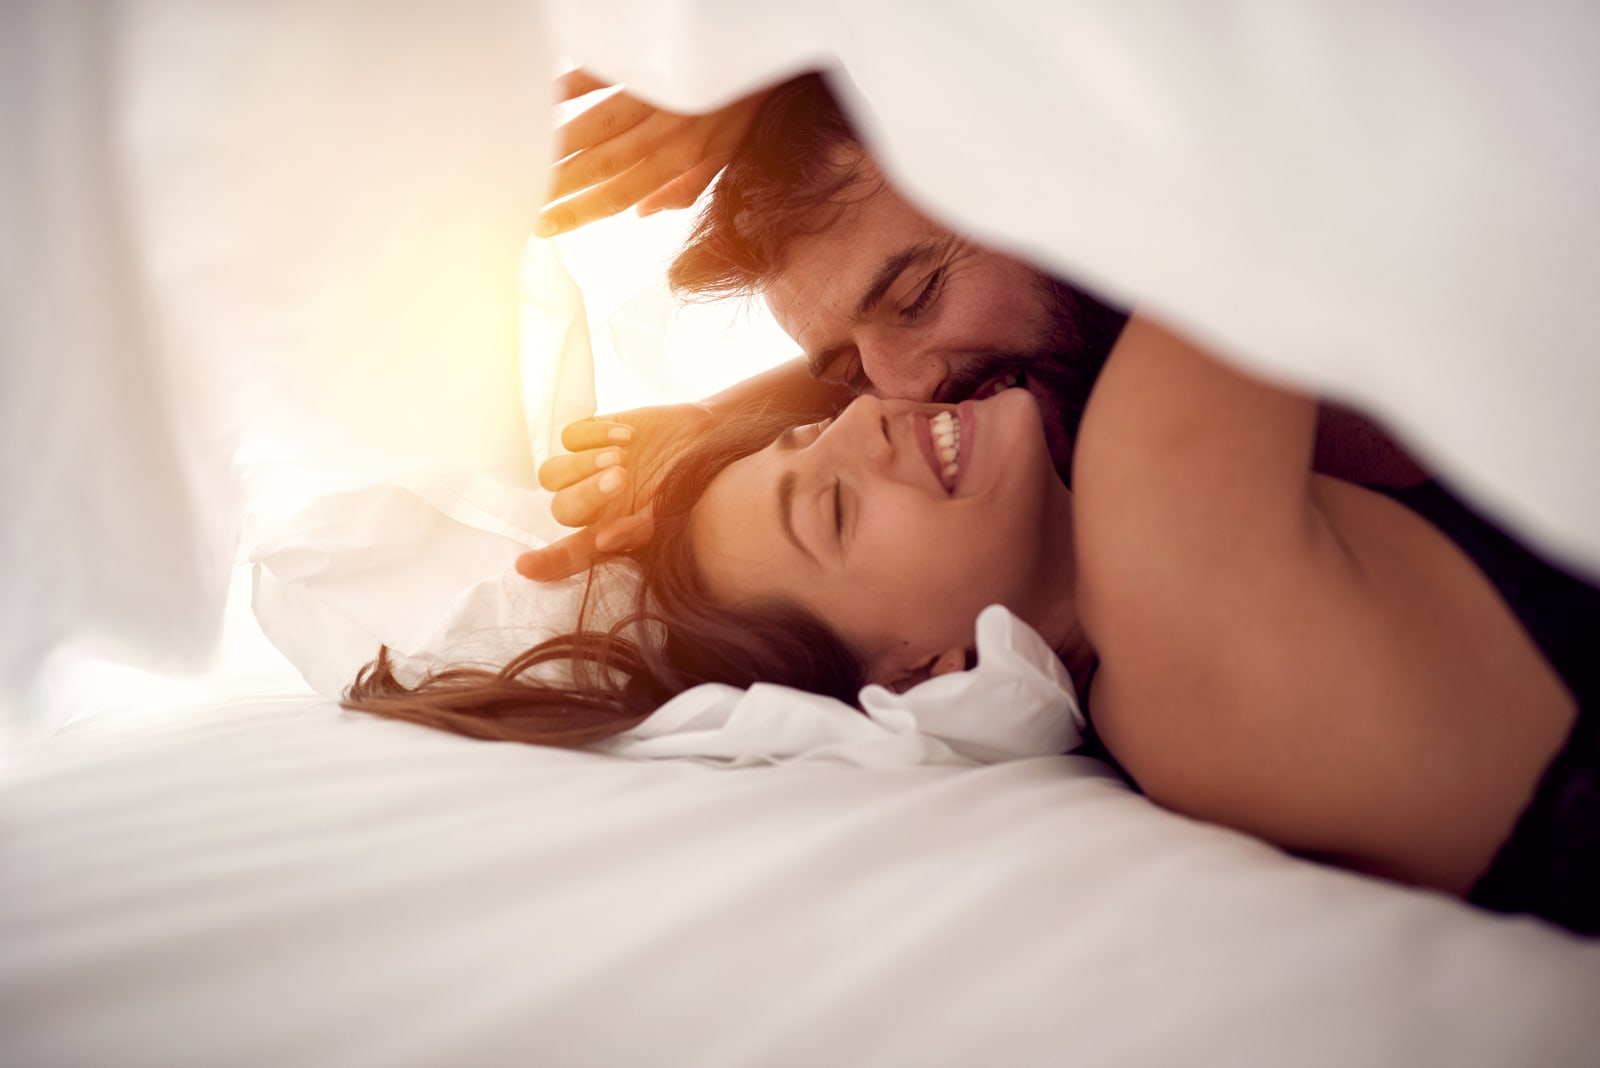 man kissing woman under the sheets